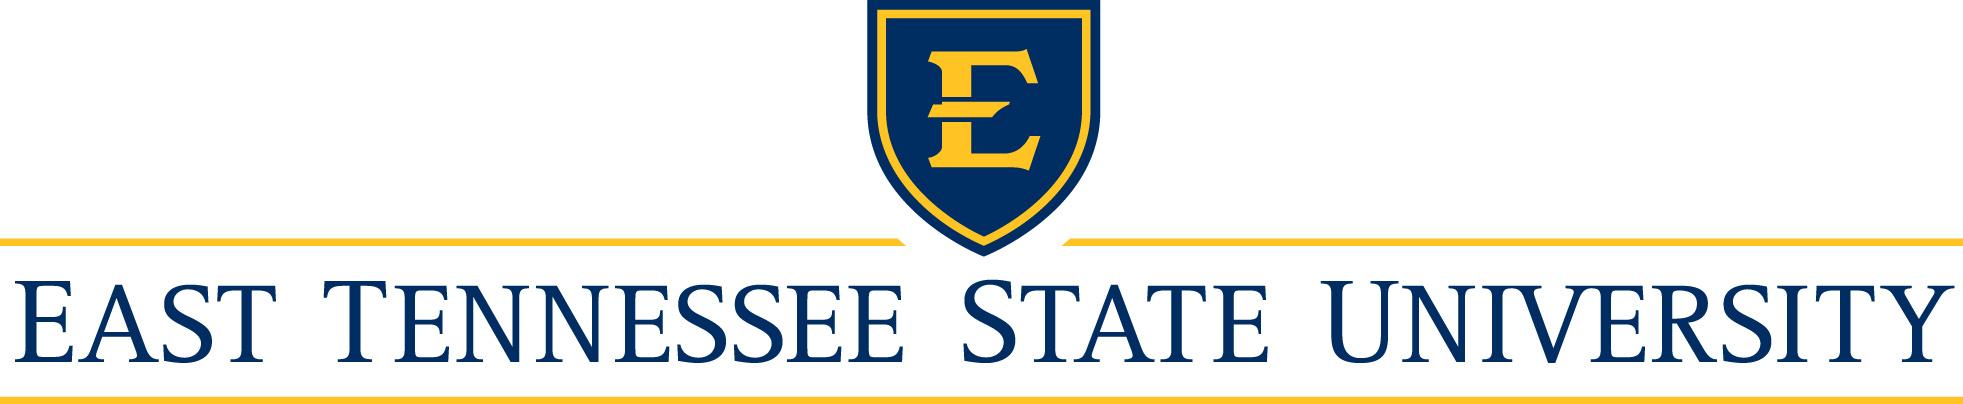 Tennessee state university logo clipart jpg royalty free Logo Use jpg royalty free